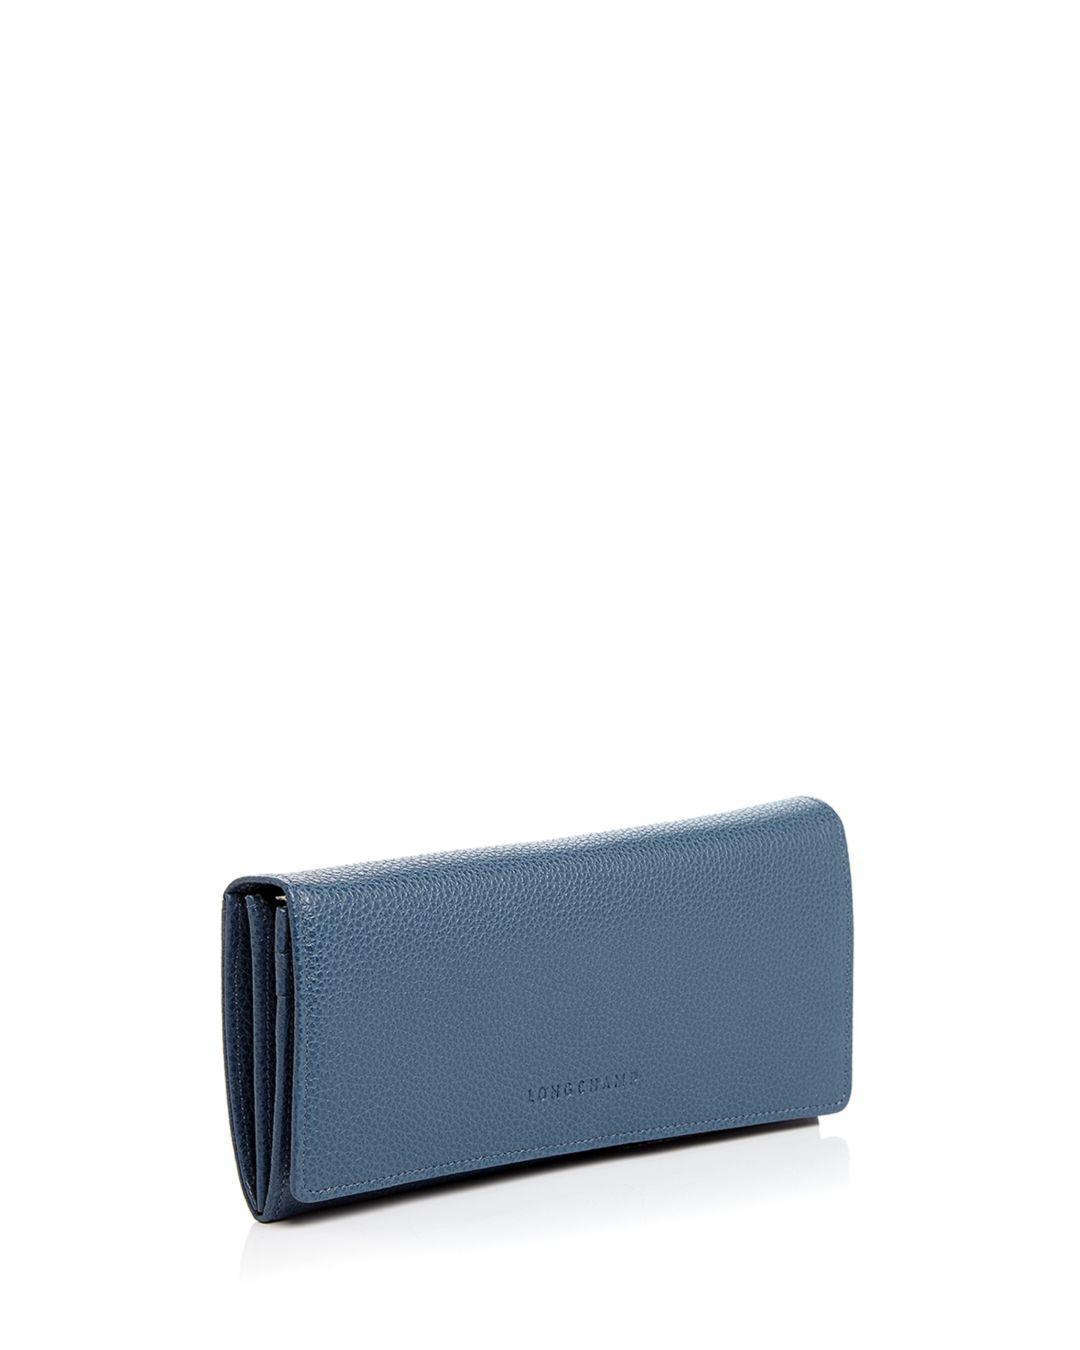 Veau Foulonne Checkbook Wallet